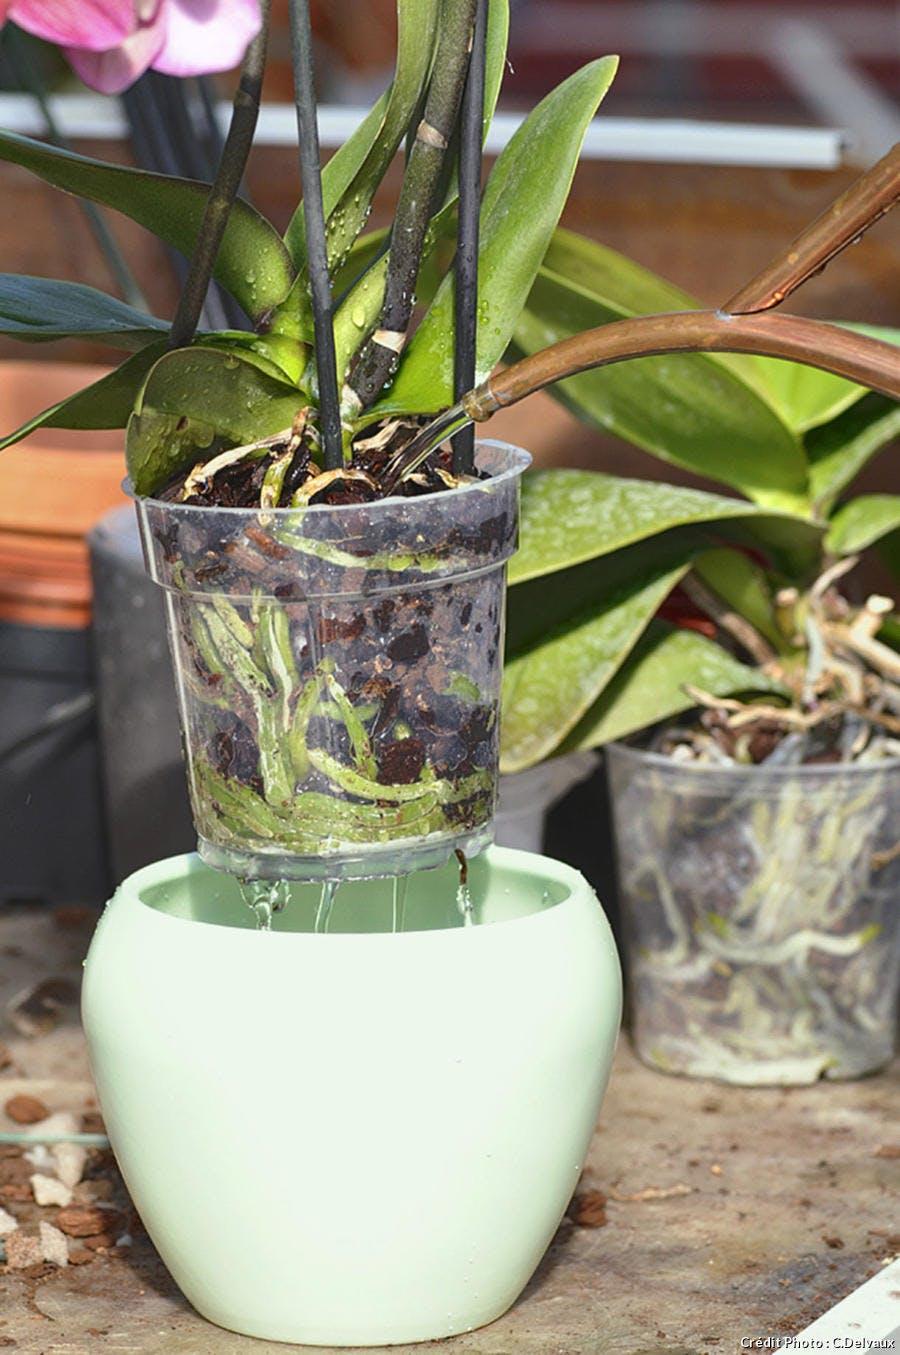 100 Incroyable Suggestions Comment Garder Une Orchidée